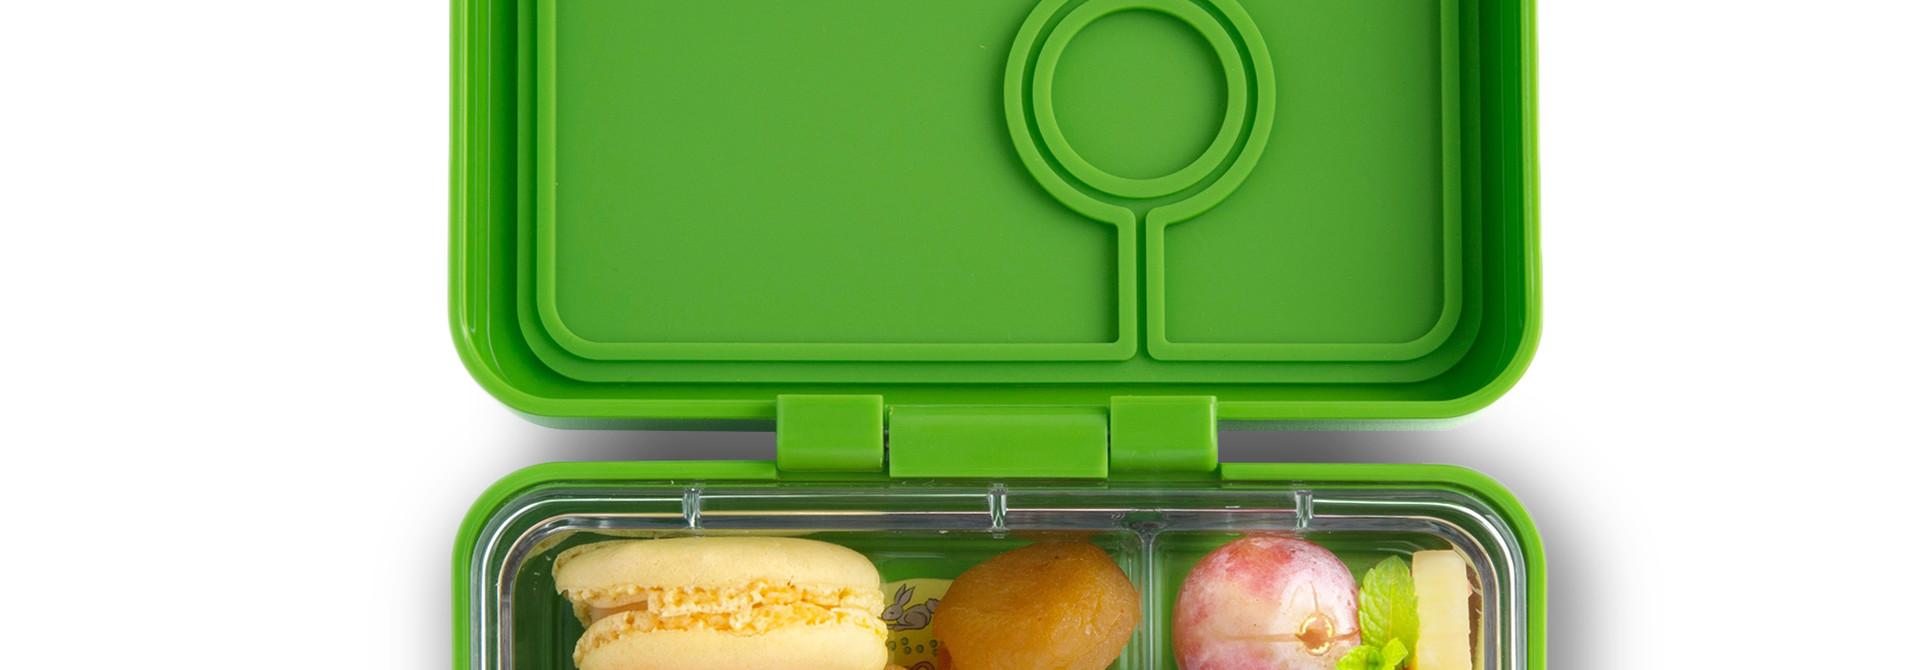 Yumbox MiniSnack 3-sections Congo groen / Toucan tray